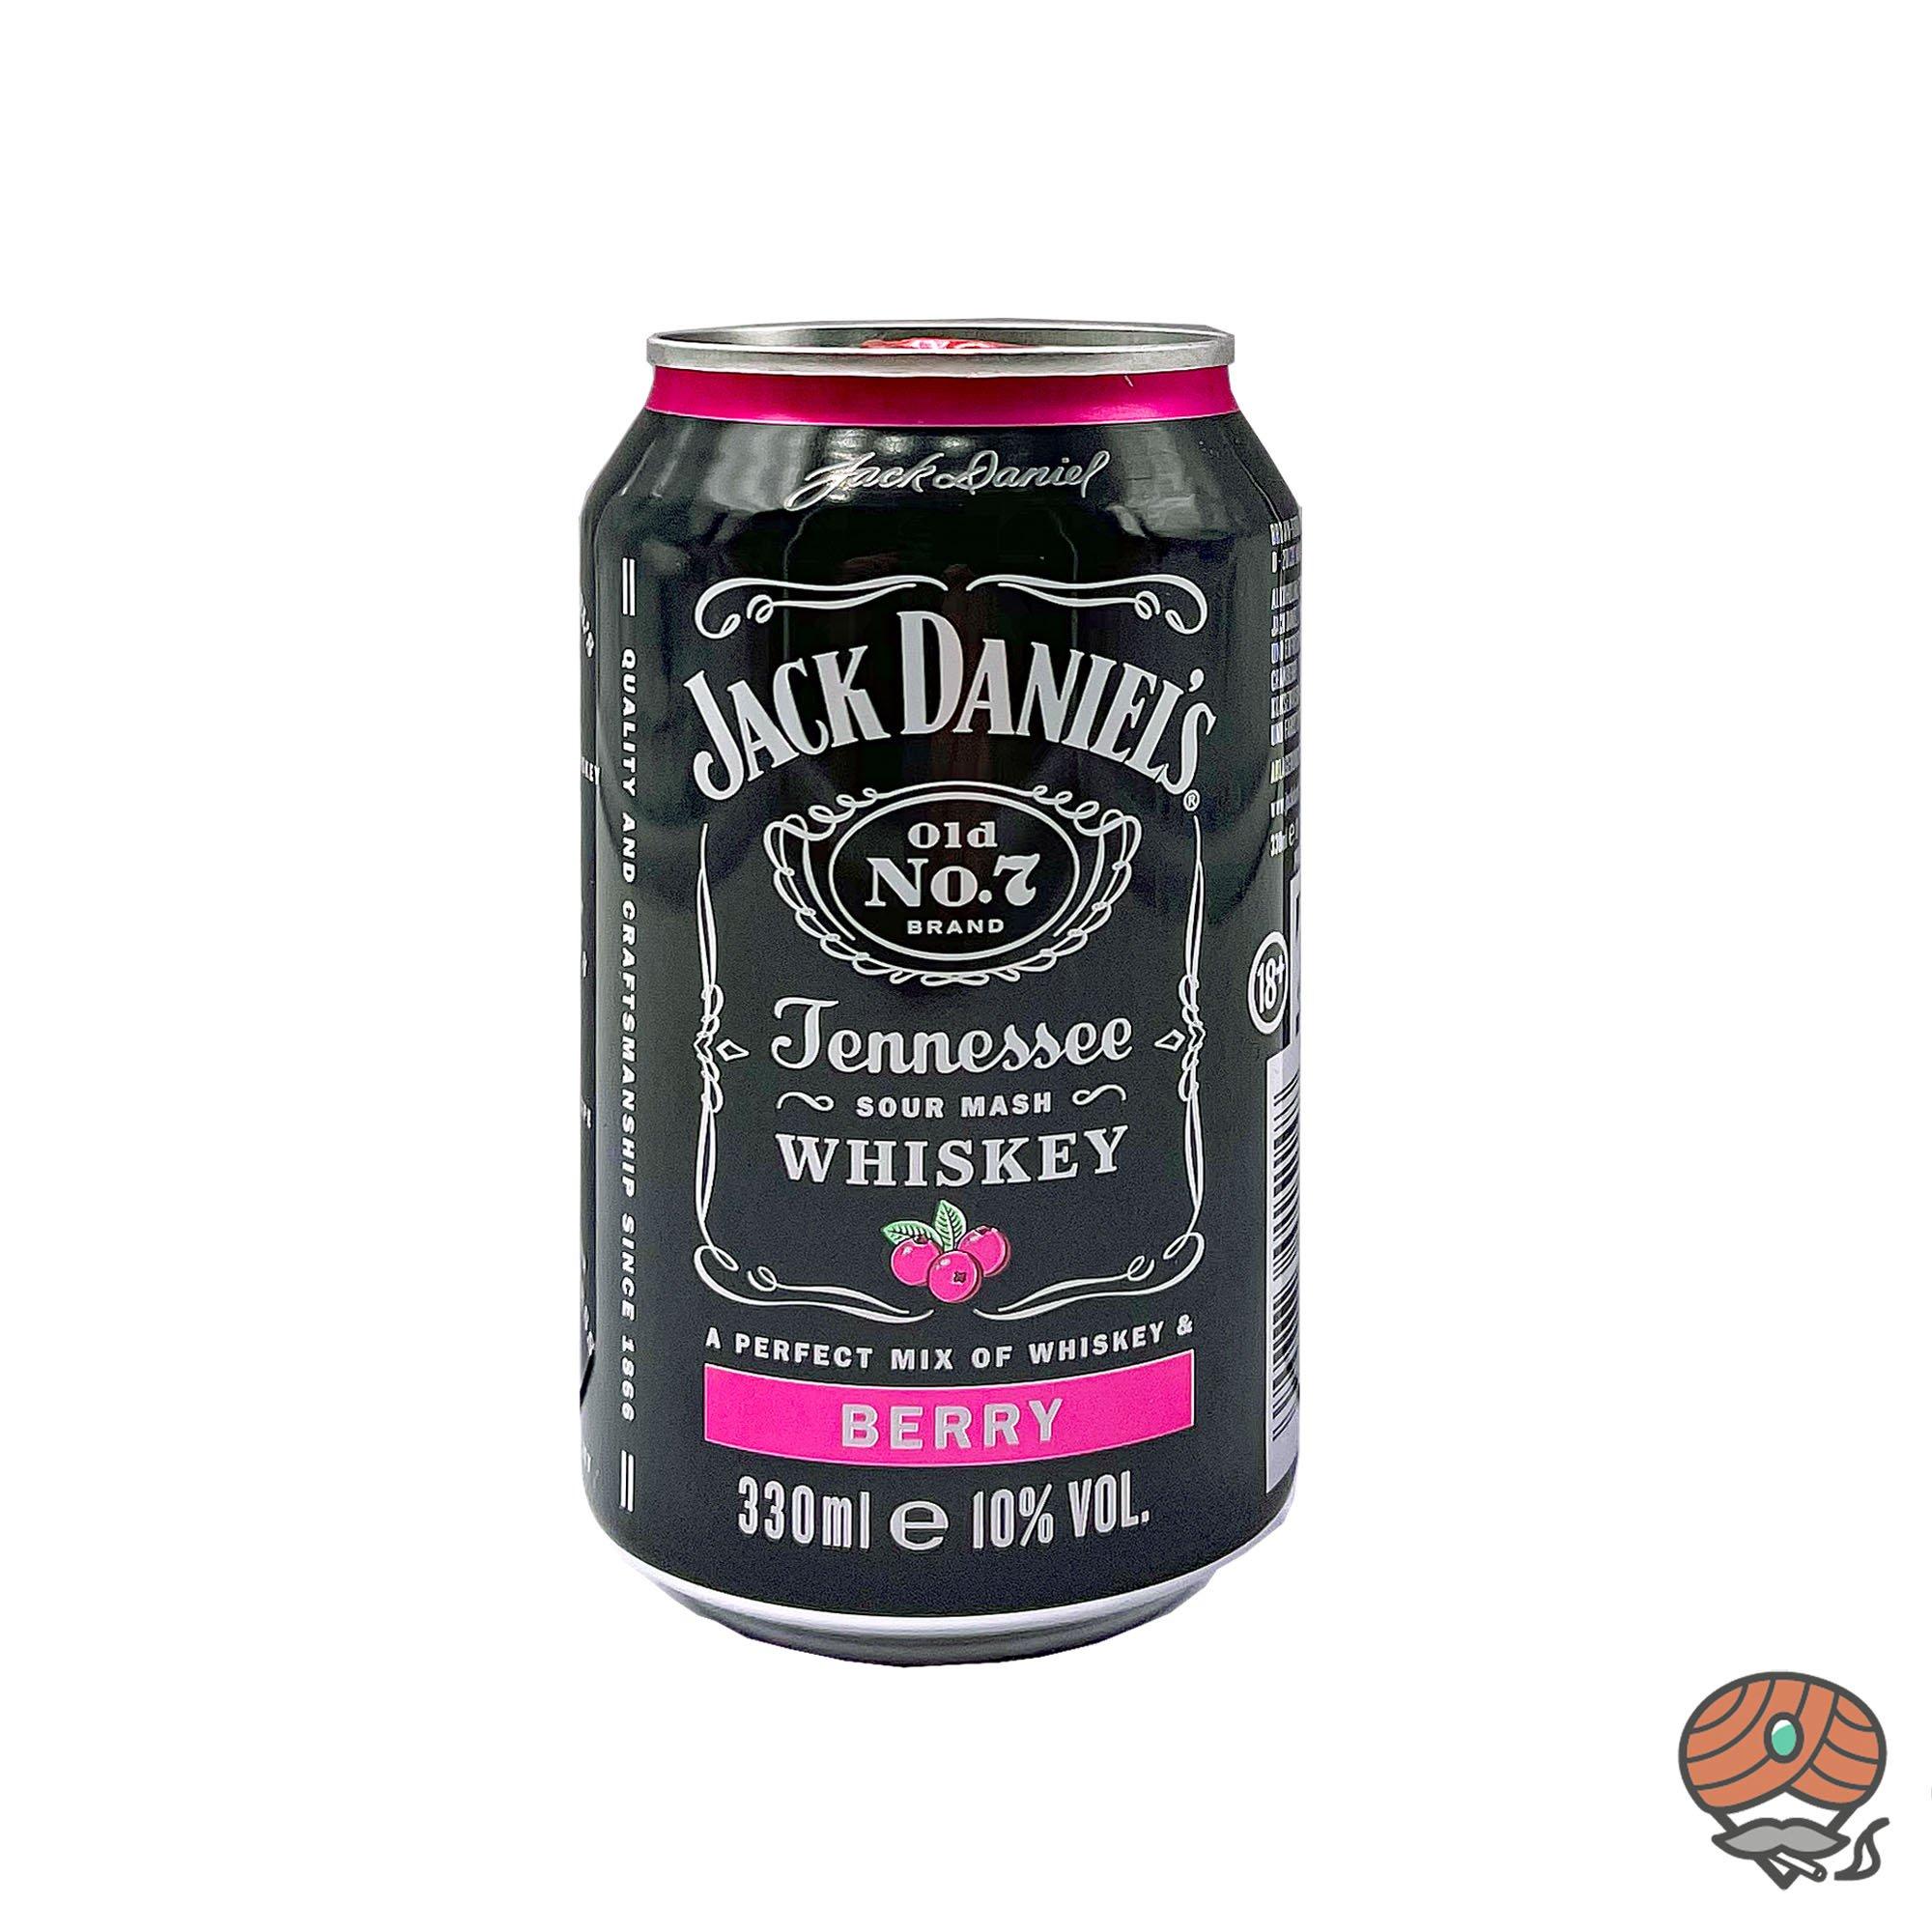 Jack Daniel´s Old No. 7 - Berry Mixgetränk 0,33 l inkl.0,25 Euro Pfand (alc. 10% Vol)